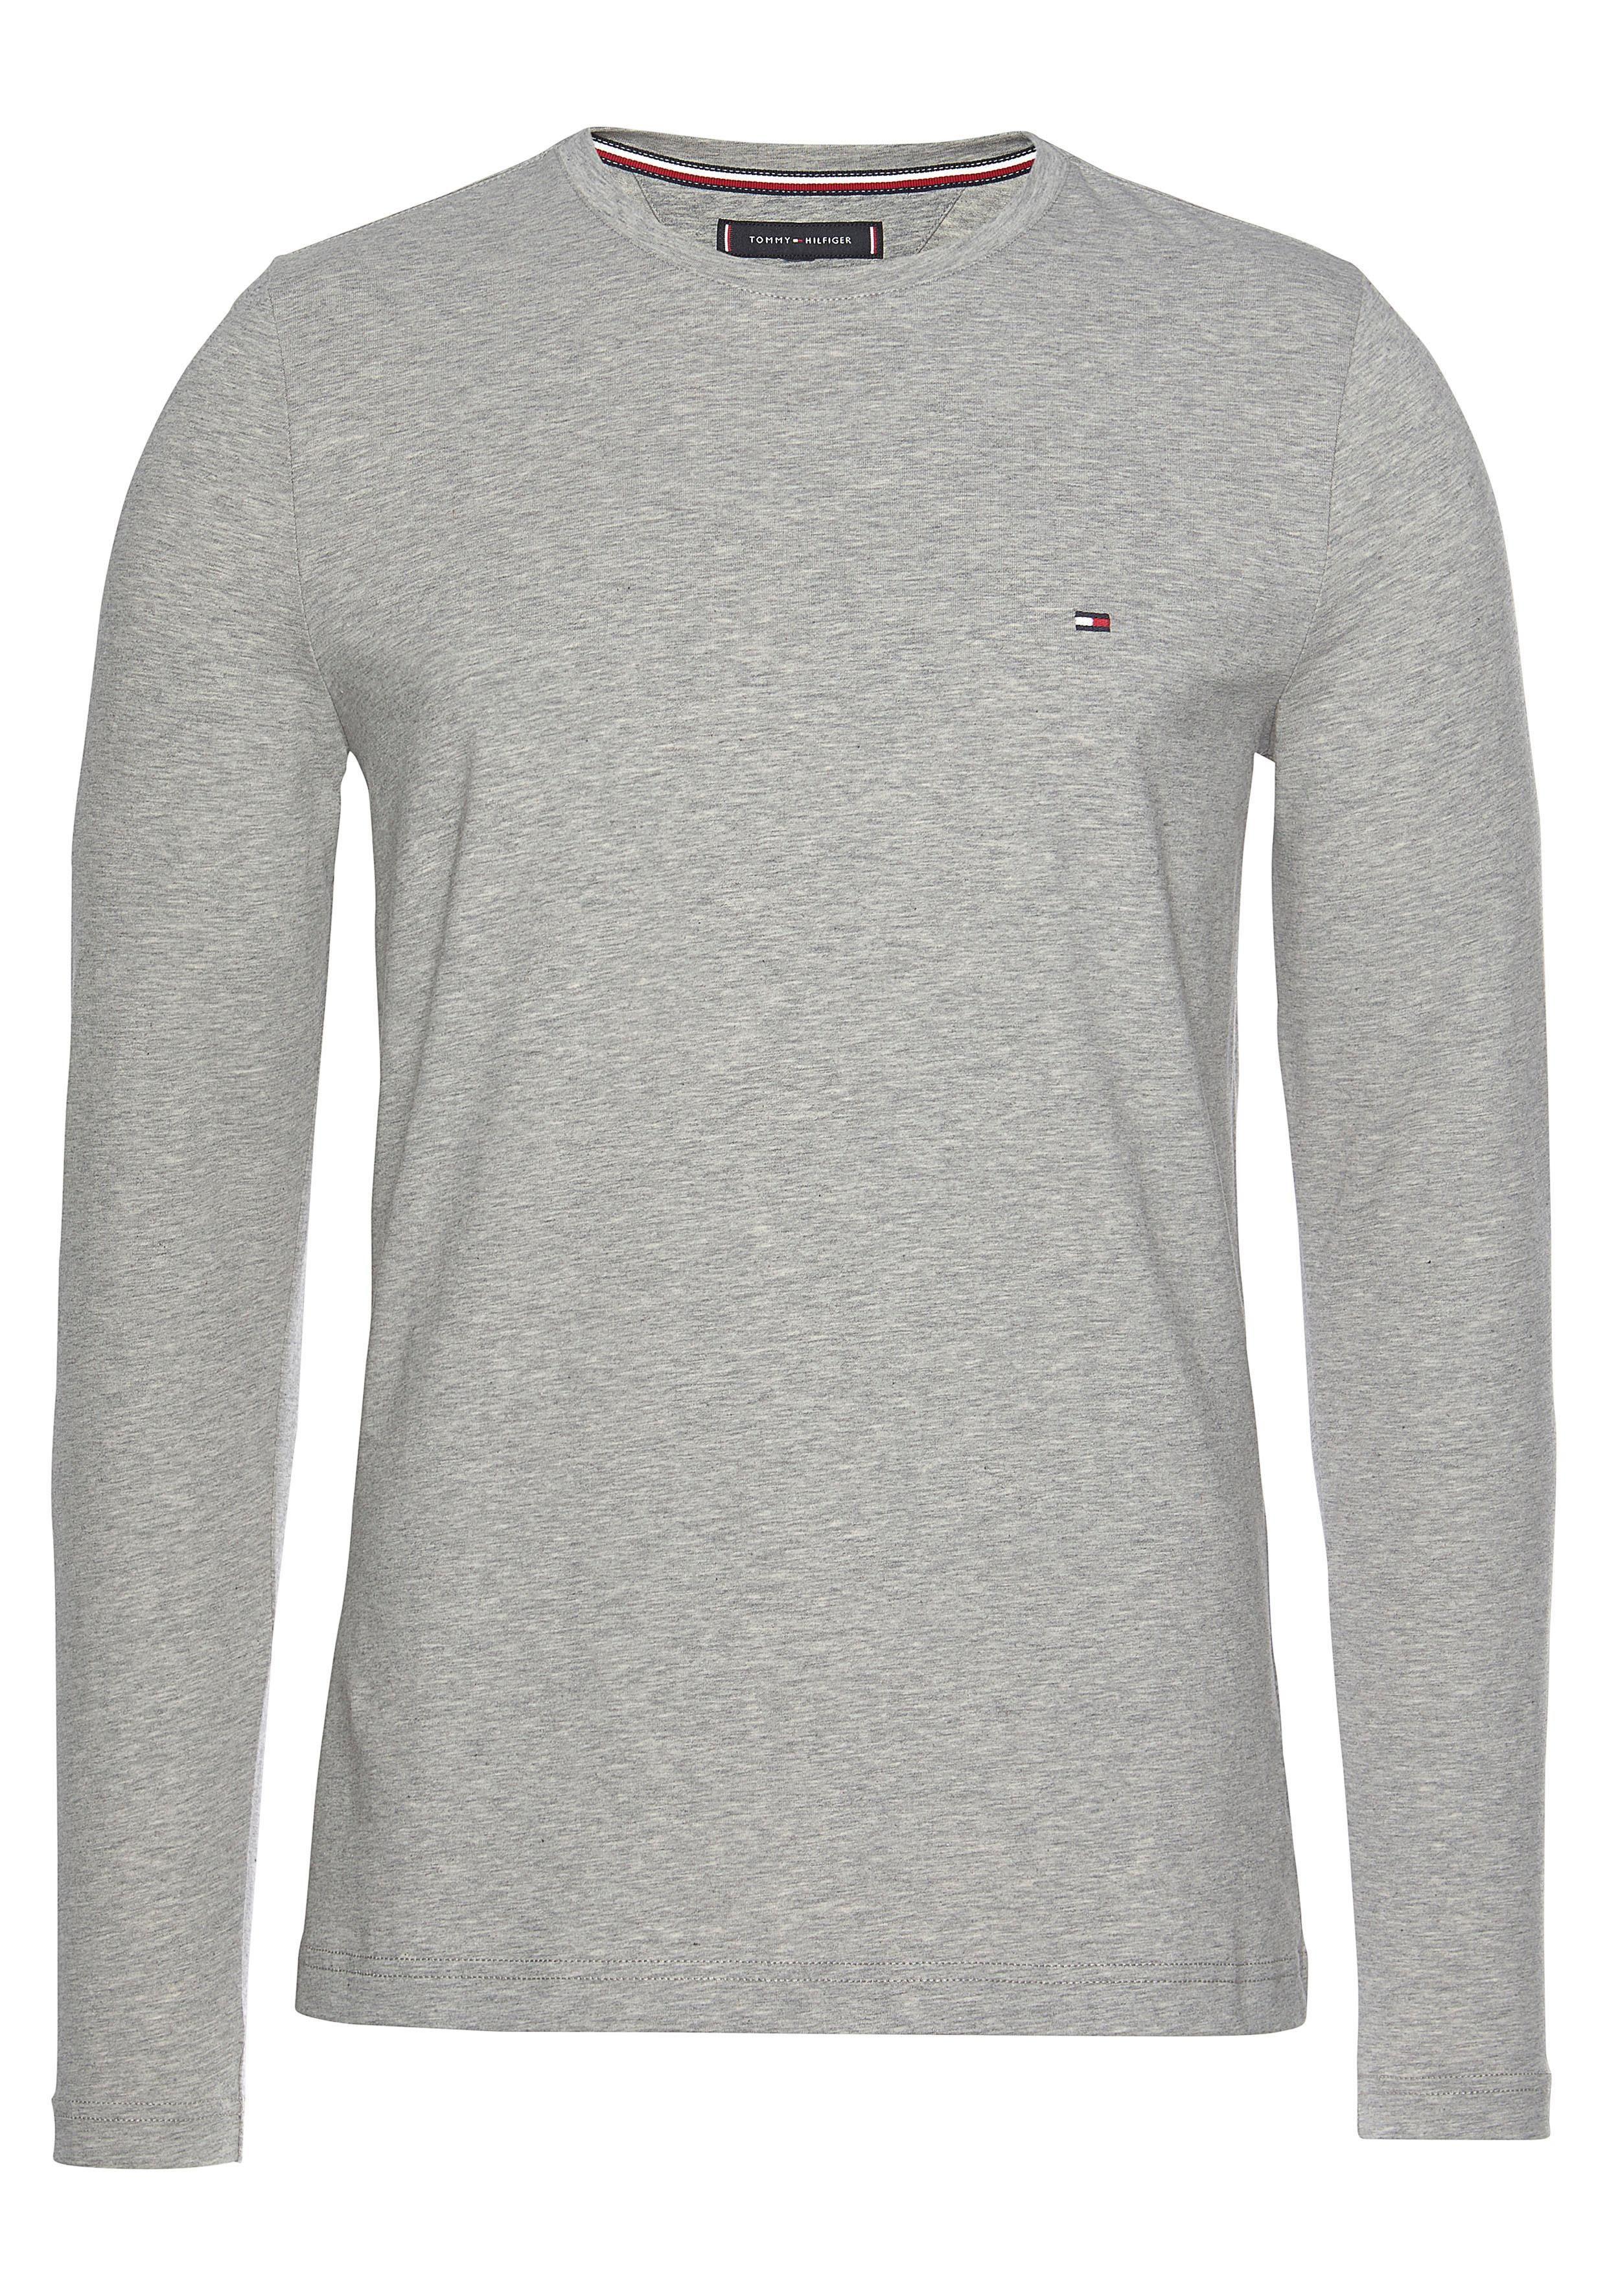 TOMMY HILFIGER Langarmshirt STRETCH SLIM FIT LONG SLEEVE   Bekleidung > Shirts > Langarm Shirts   Tommy Hilfiger